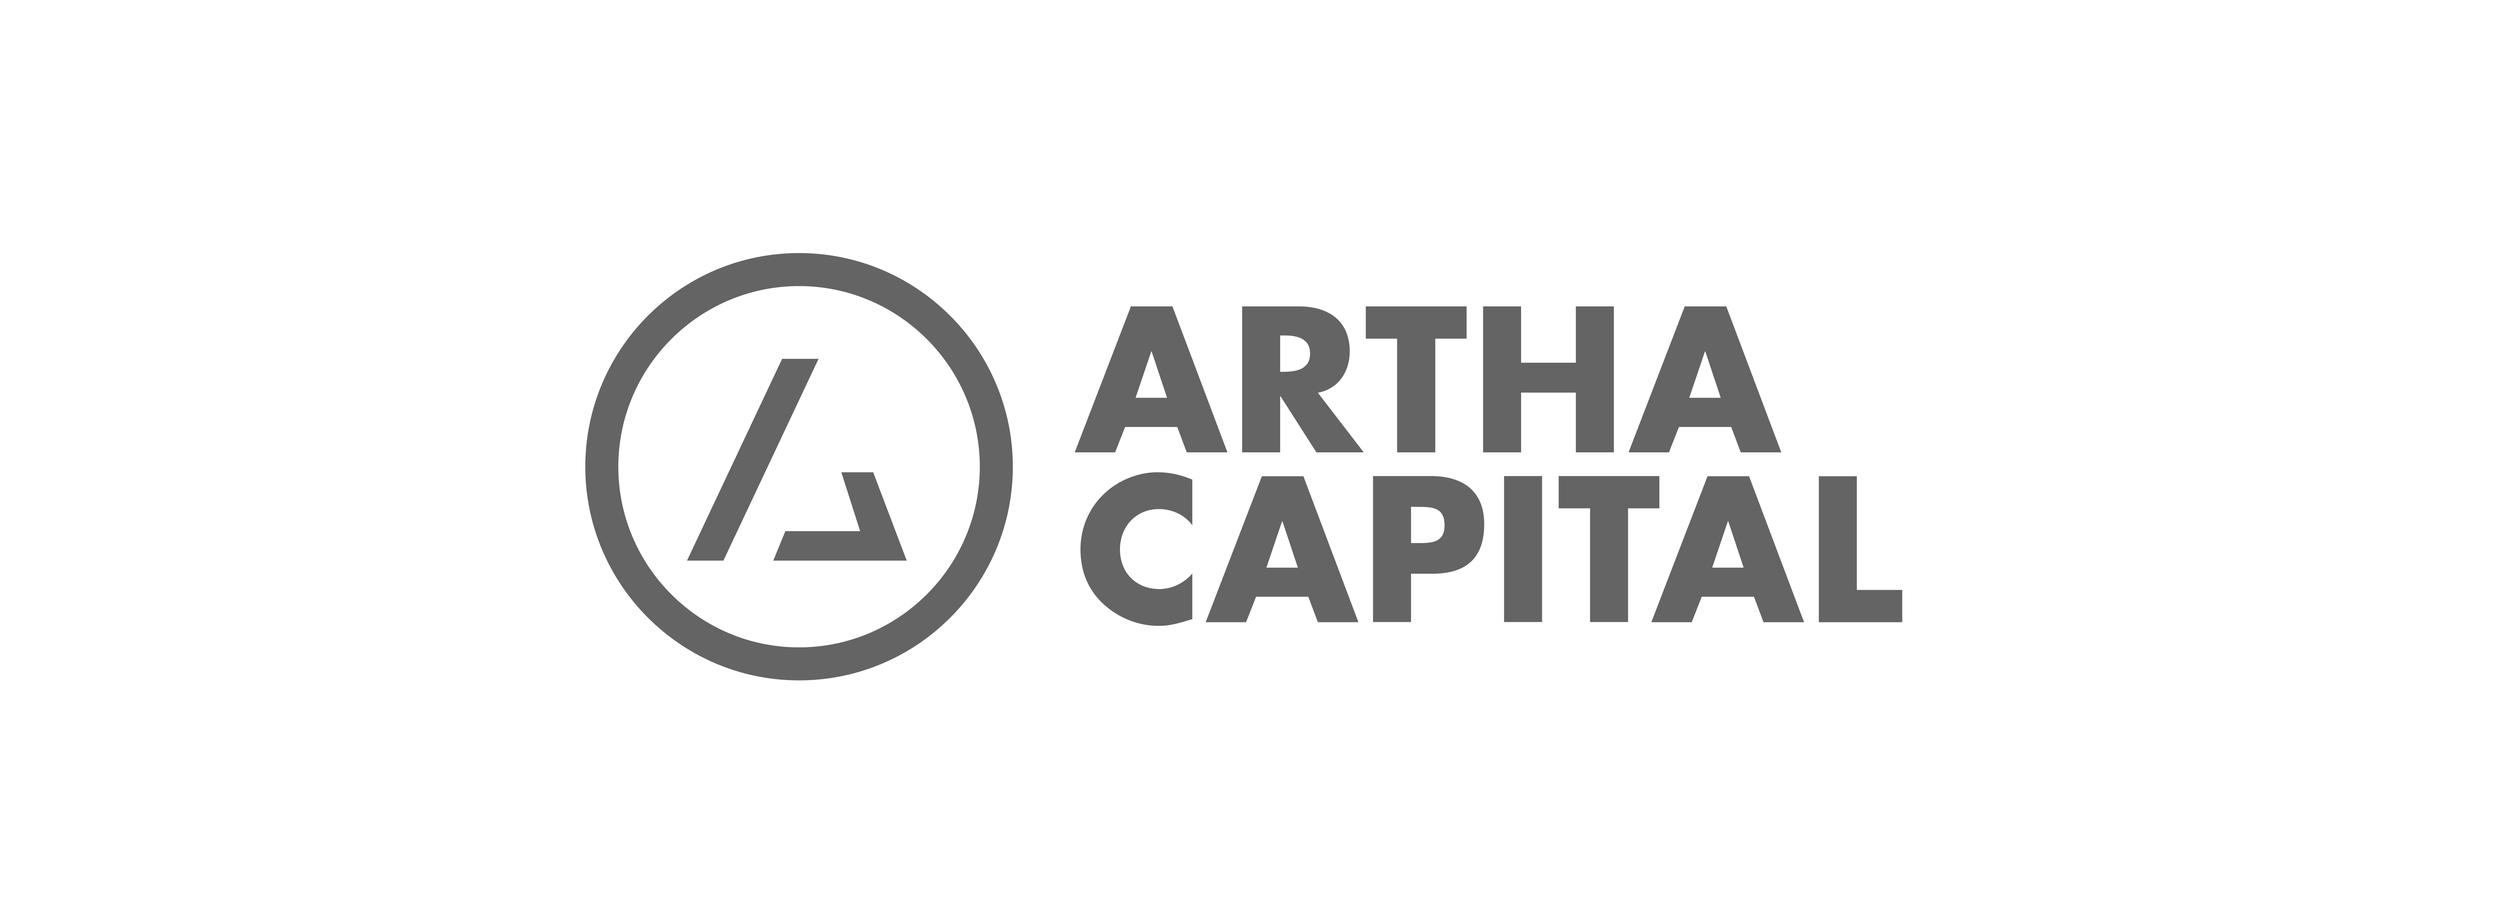 artha-capital.png